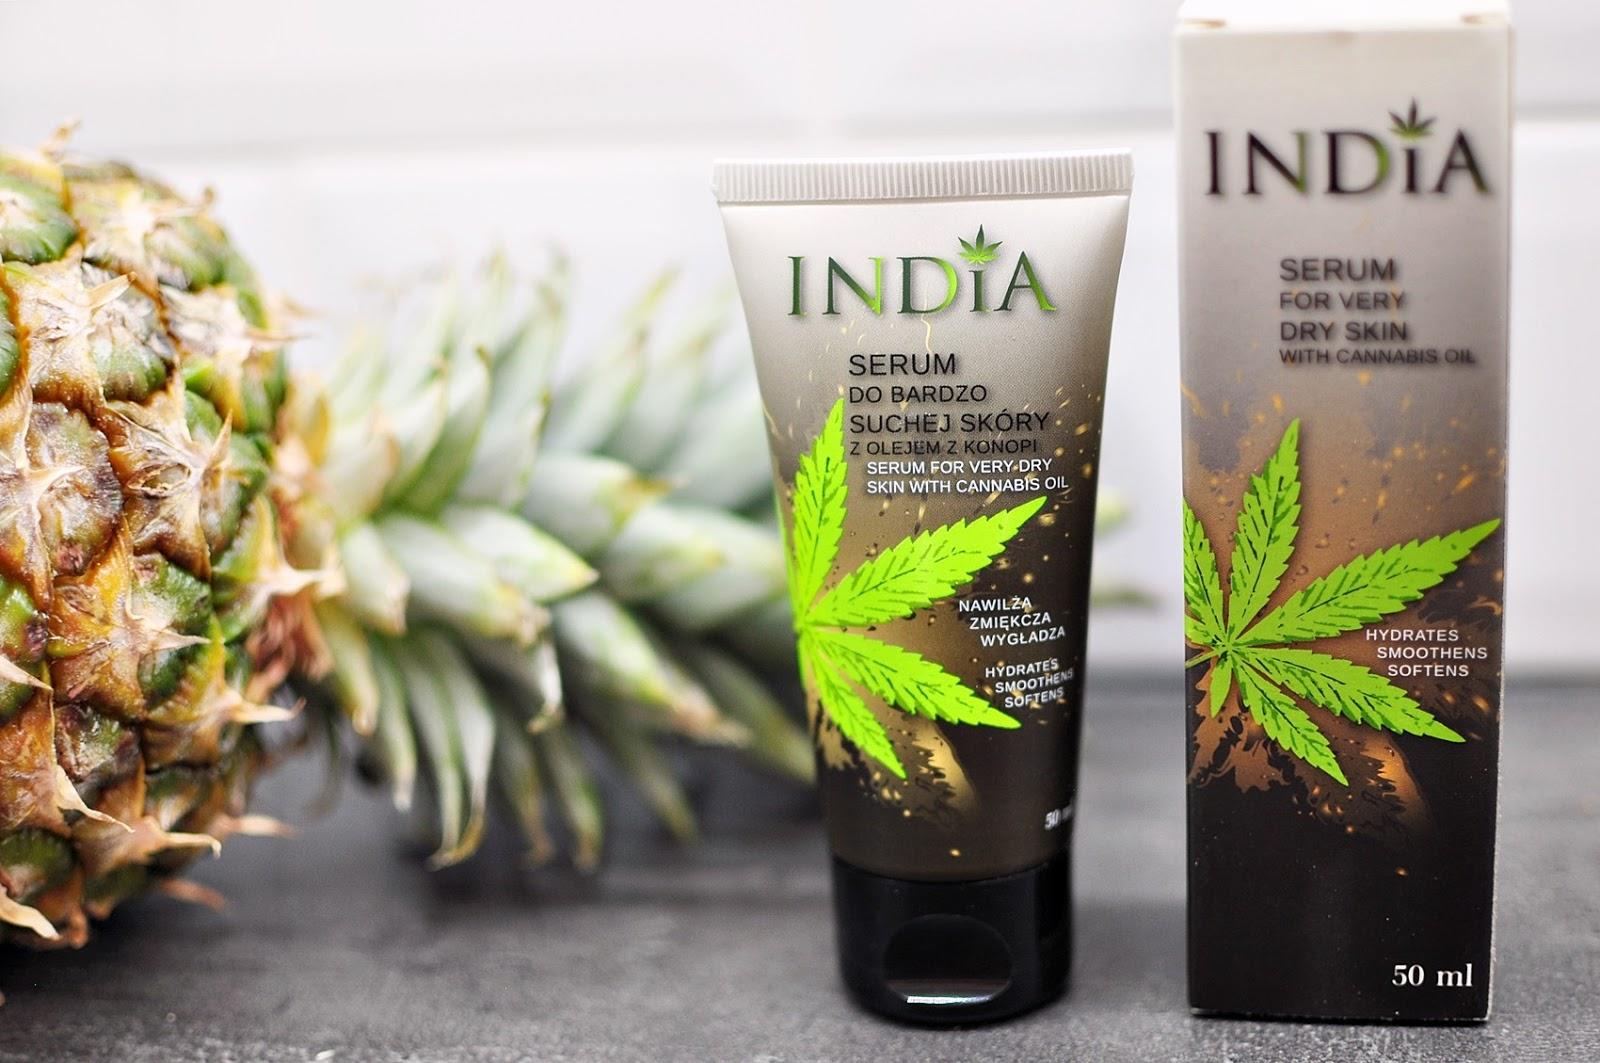 kosmetyki-inspirowane-Indiami-opinie